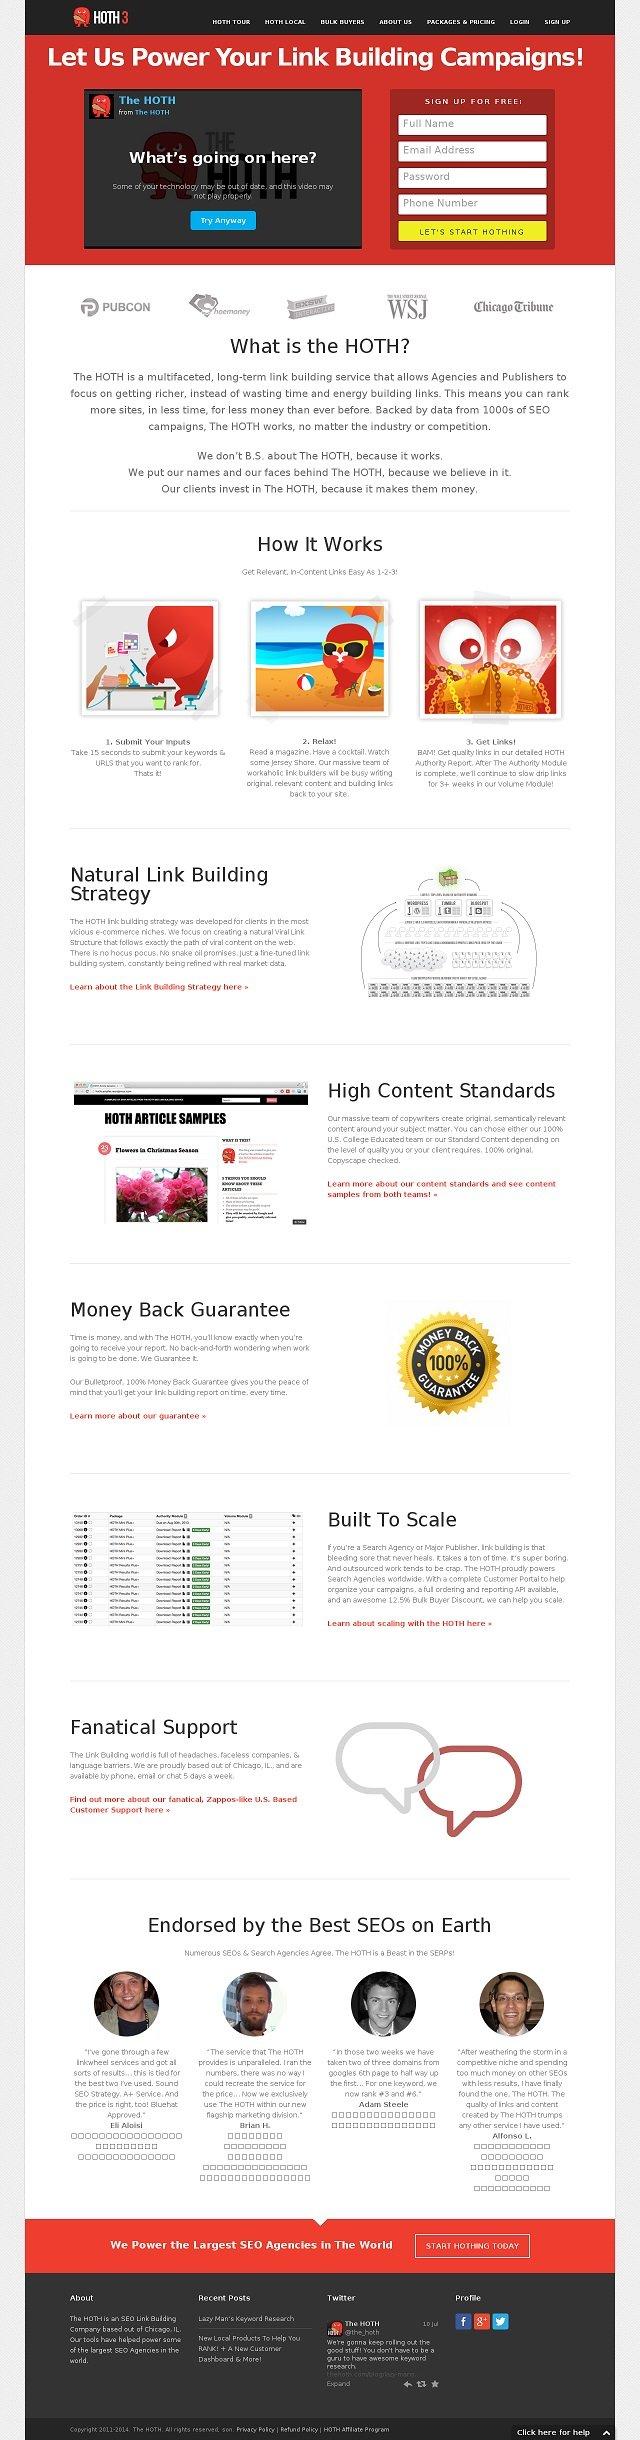 thehoth_original_homepage